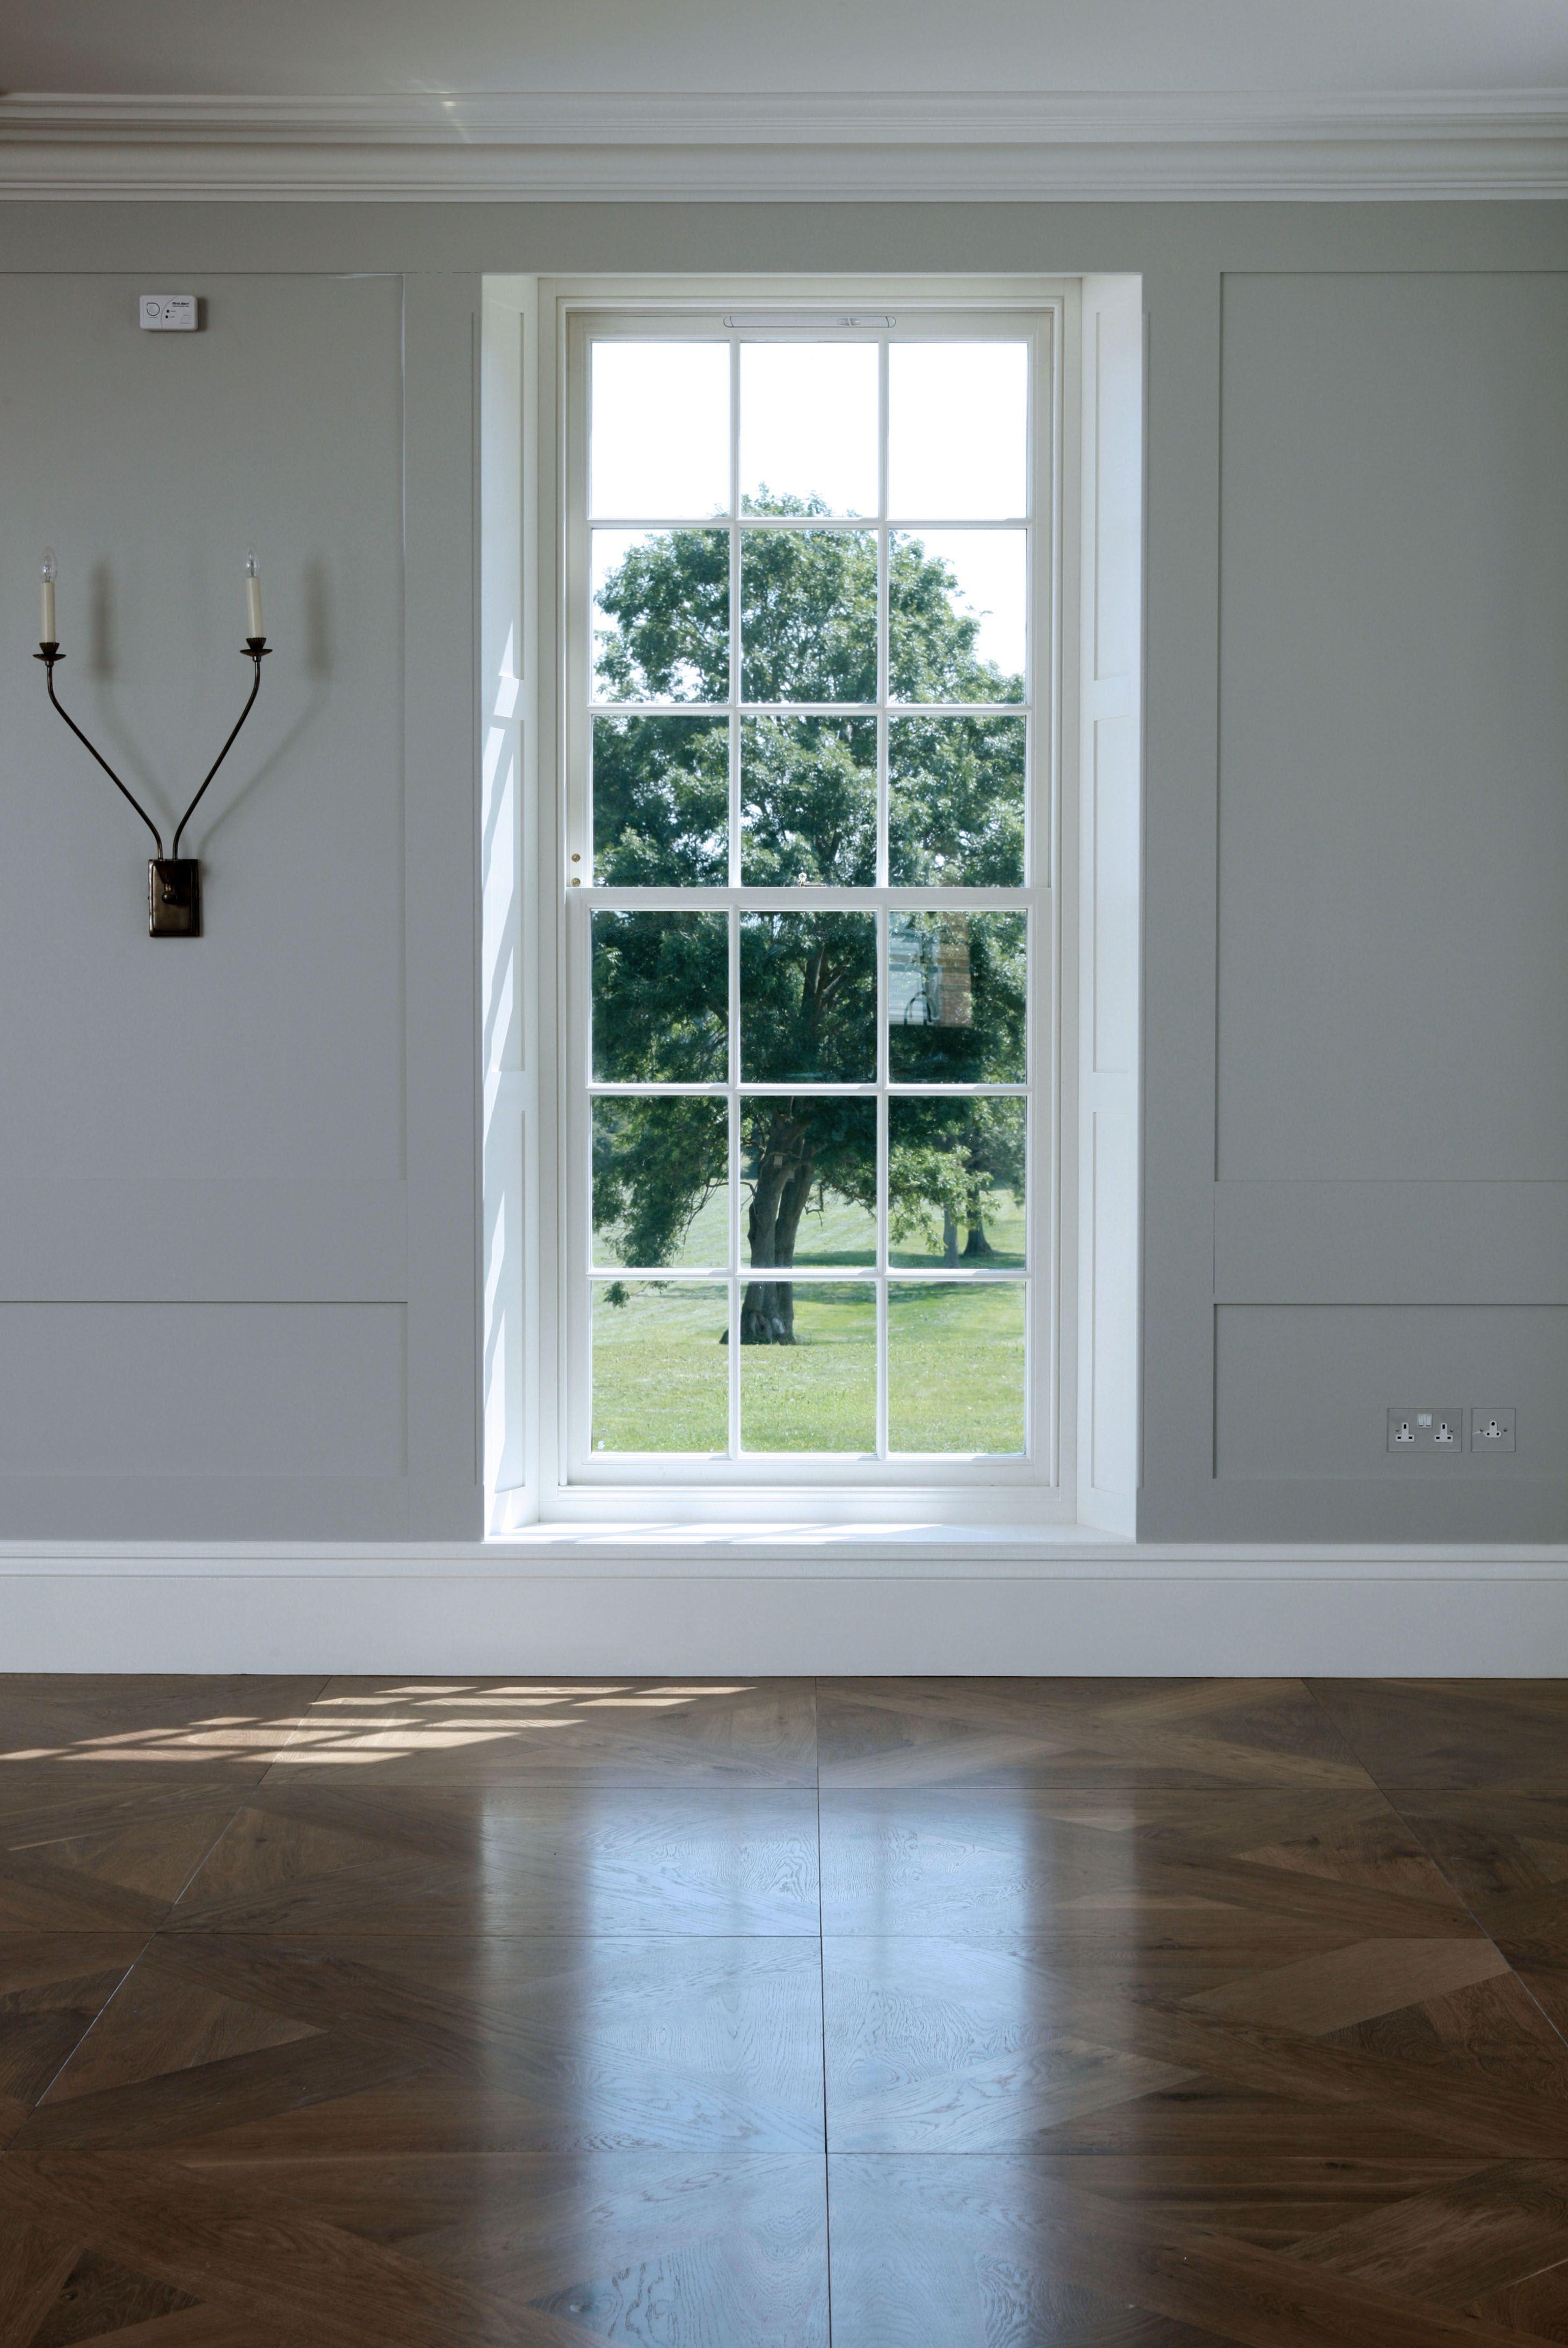 ESB Flooring Offers Floor Panels and Parquet Flooring. We